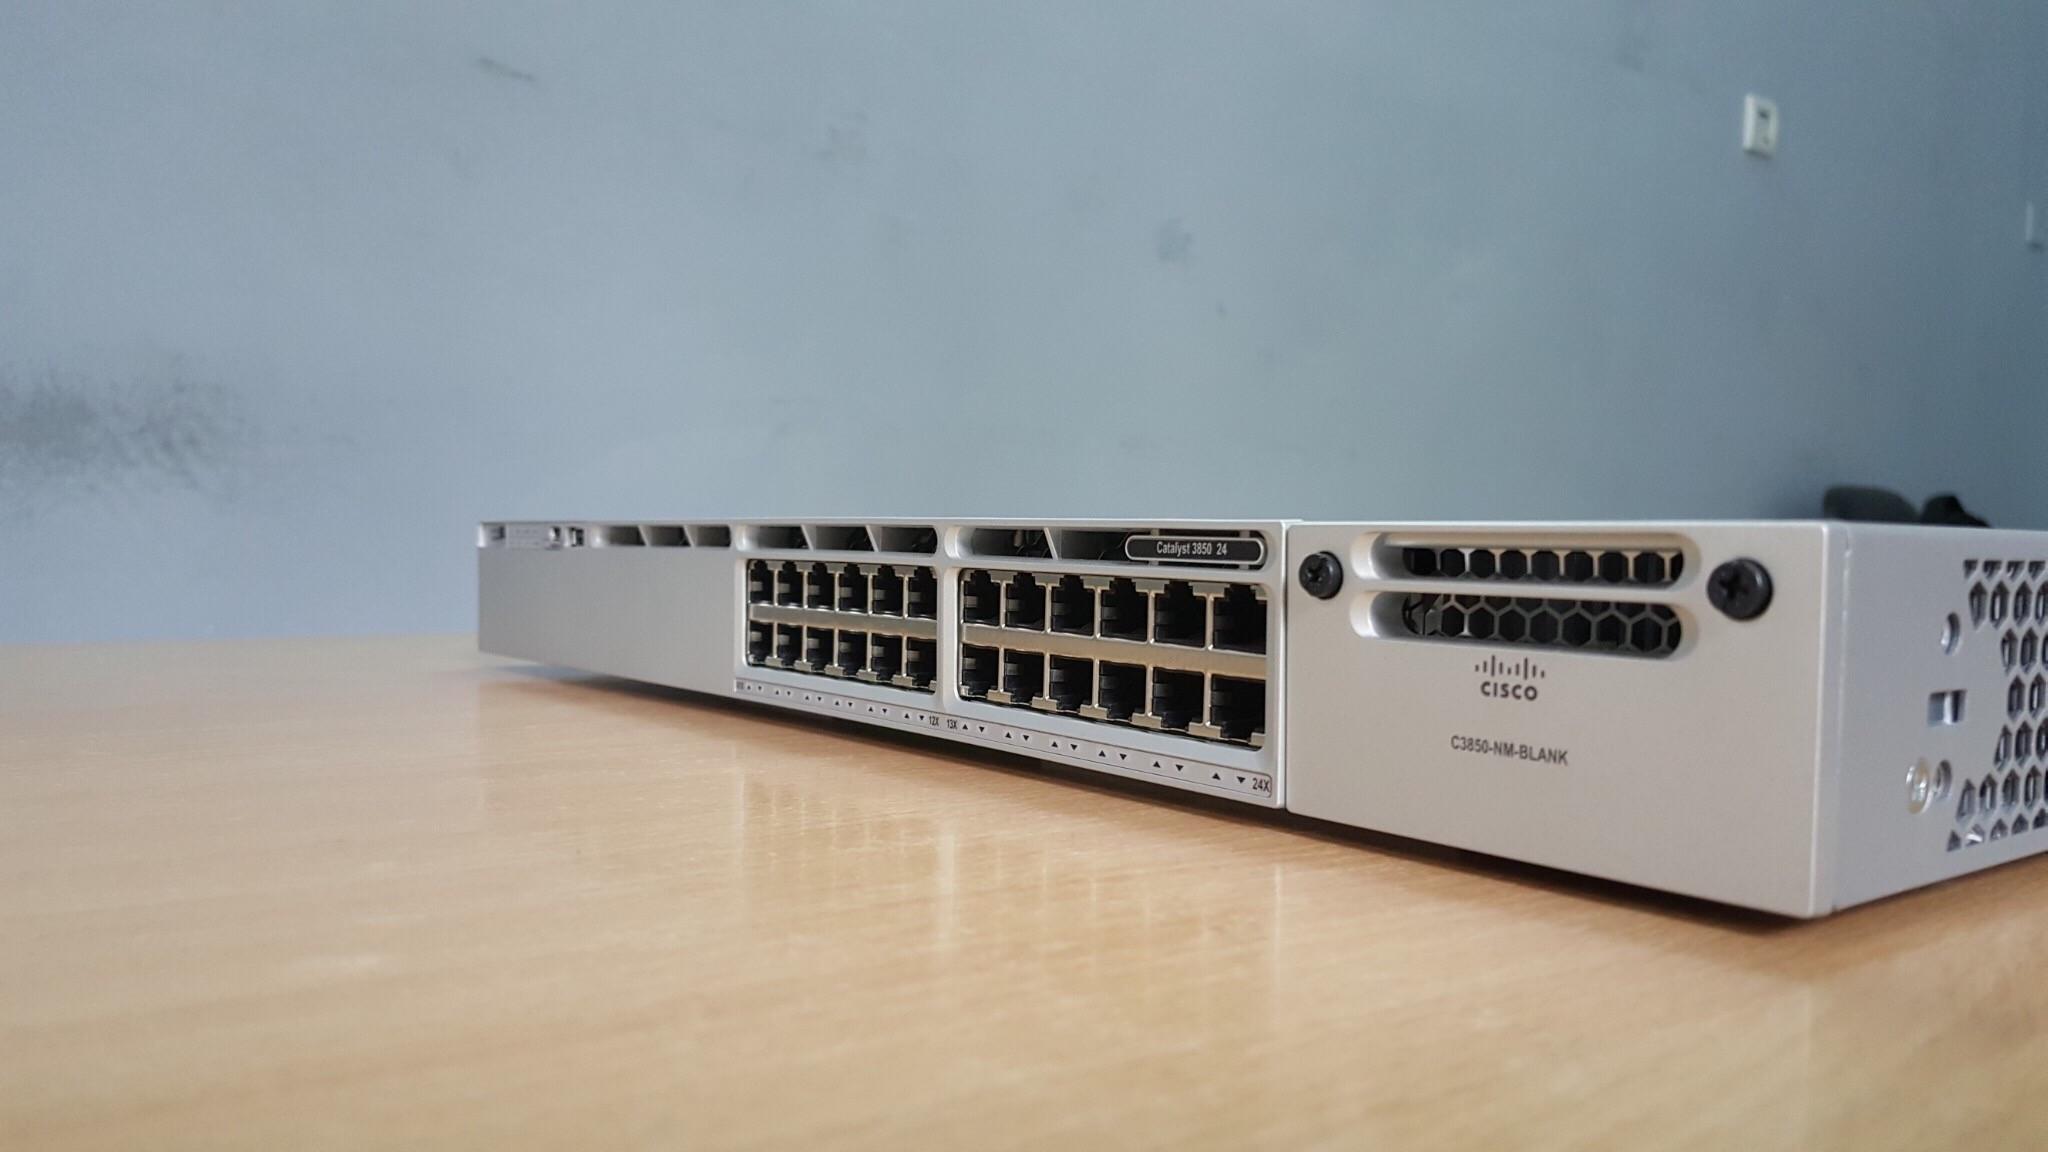 Core Switch Cisco 3850